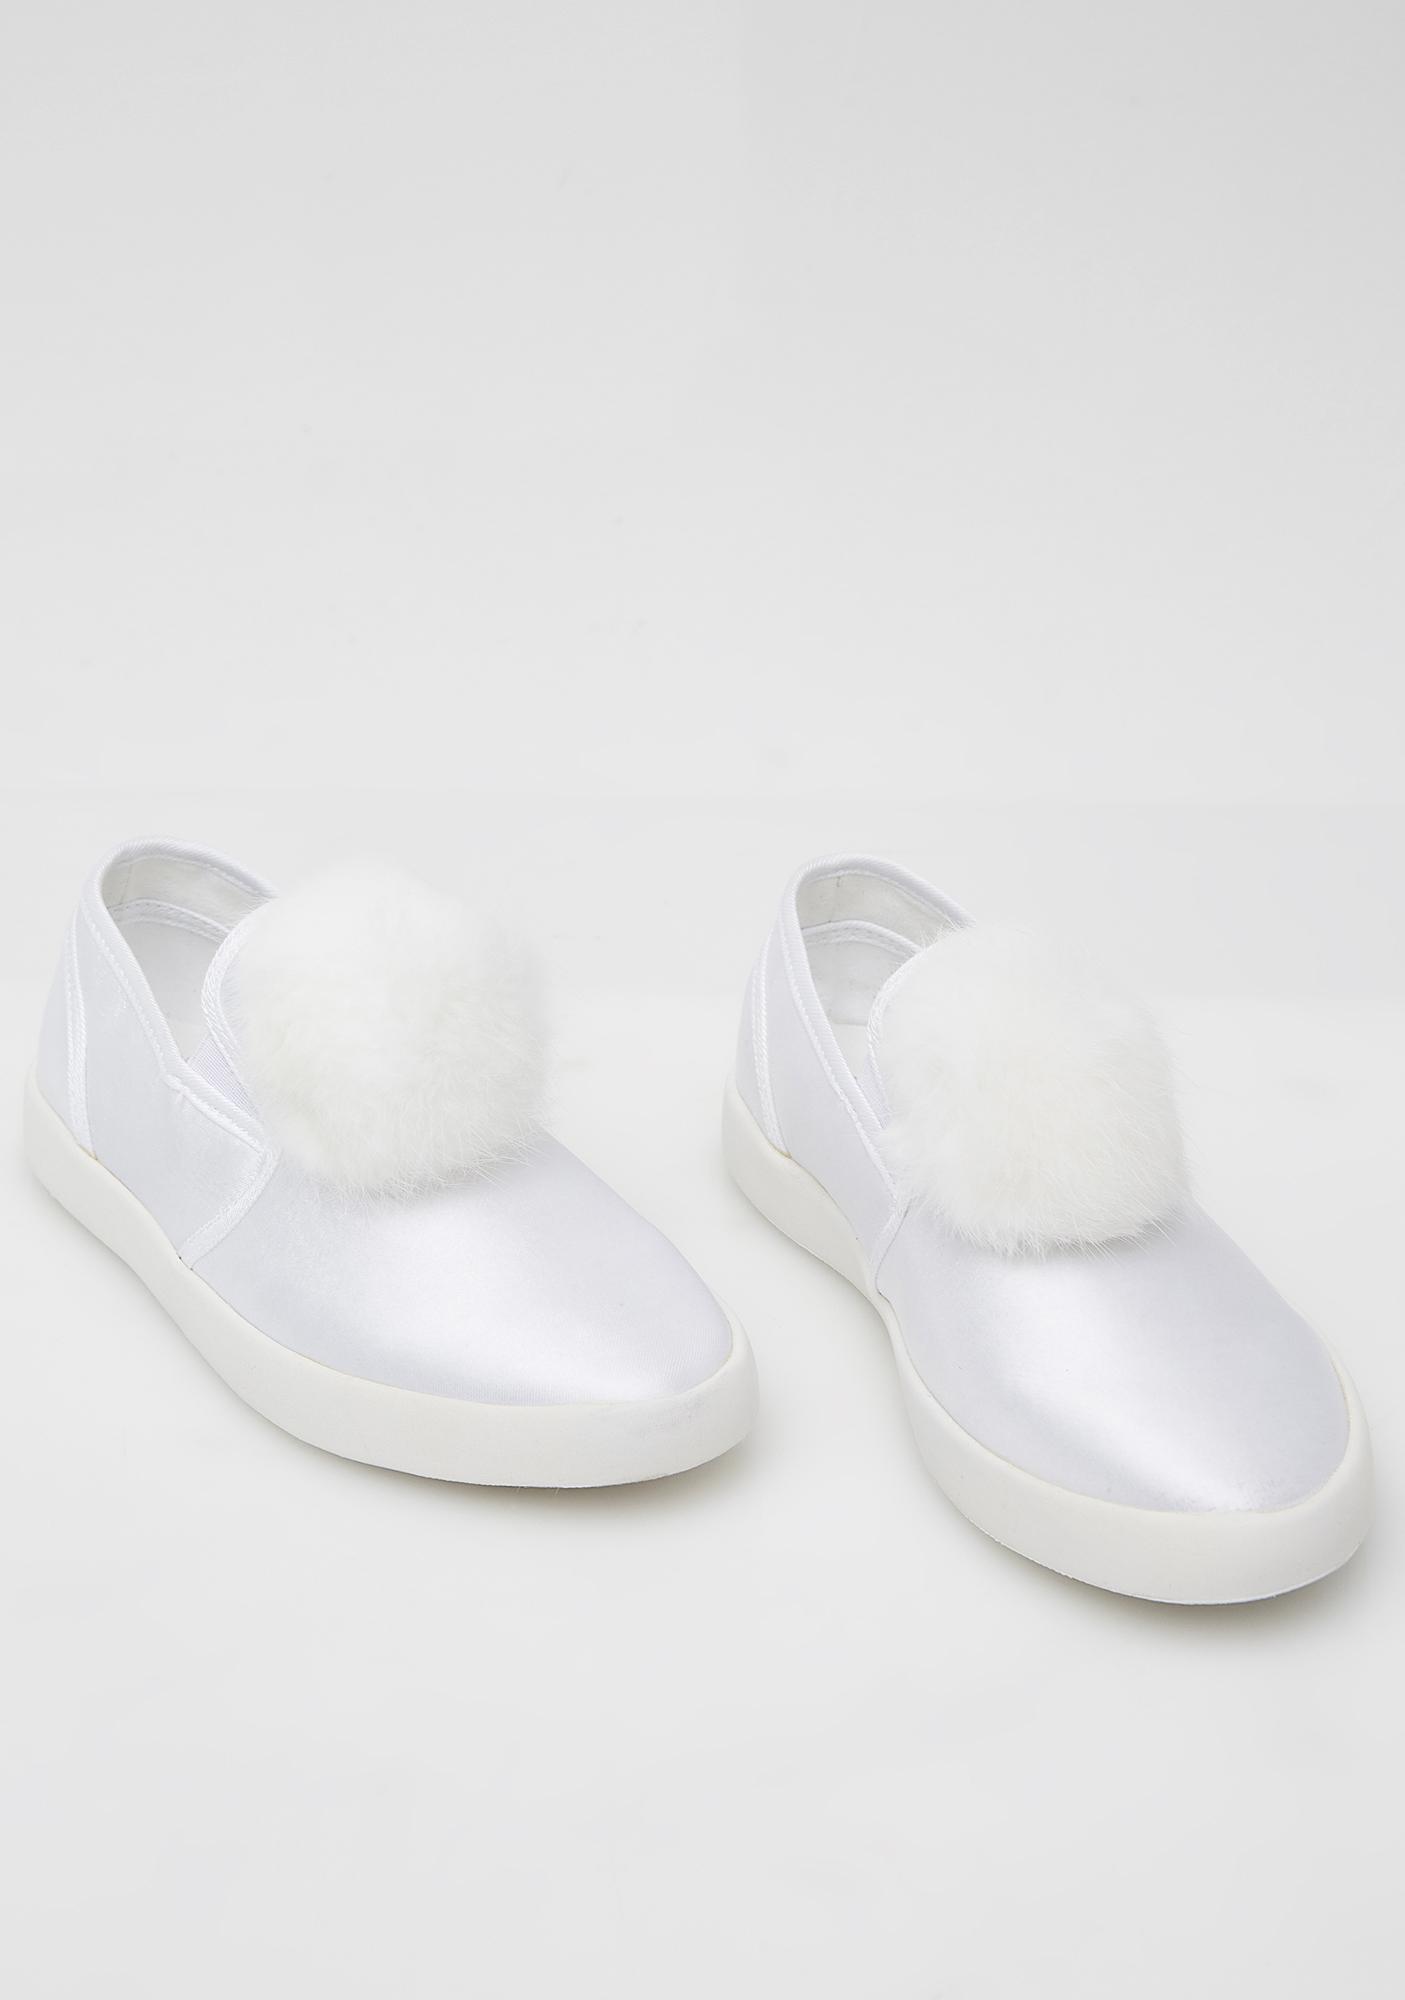 Y.R.U. Icy Pom Pom Shoes